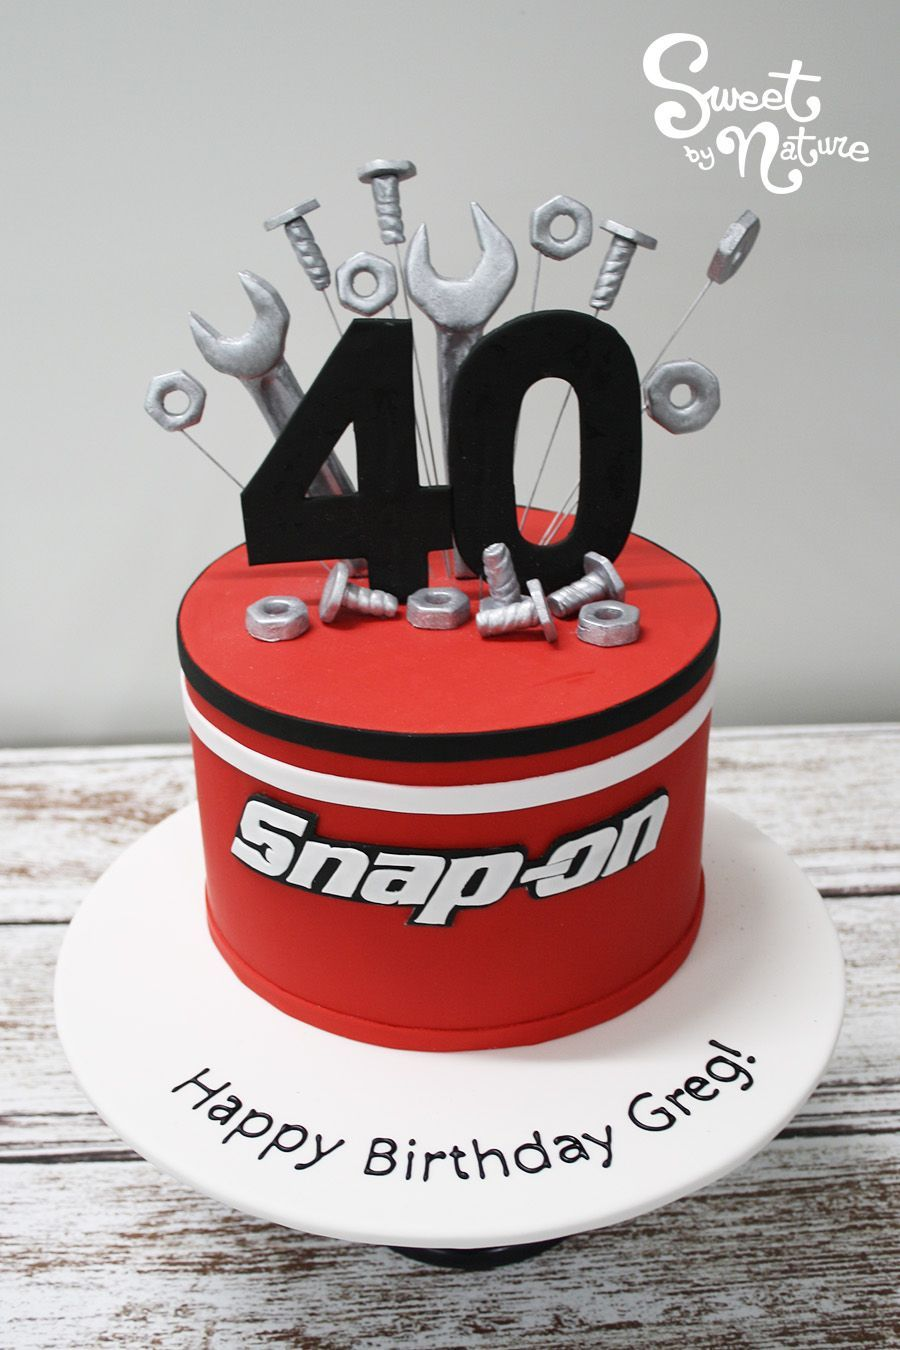 Remarkable Pin By Thomas Denys On Gateaux 40Th Birthday Cakes Dad Birthday Funny Birthday Cards Online Inifodamsfinfo